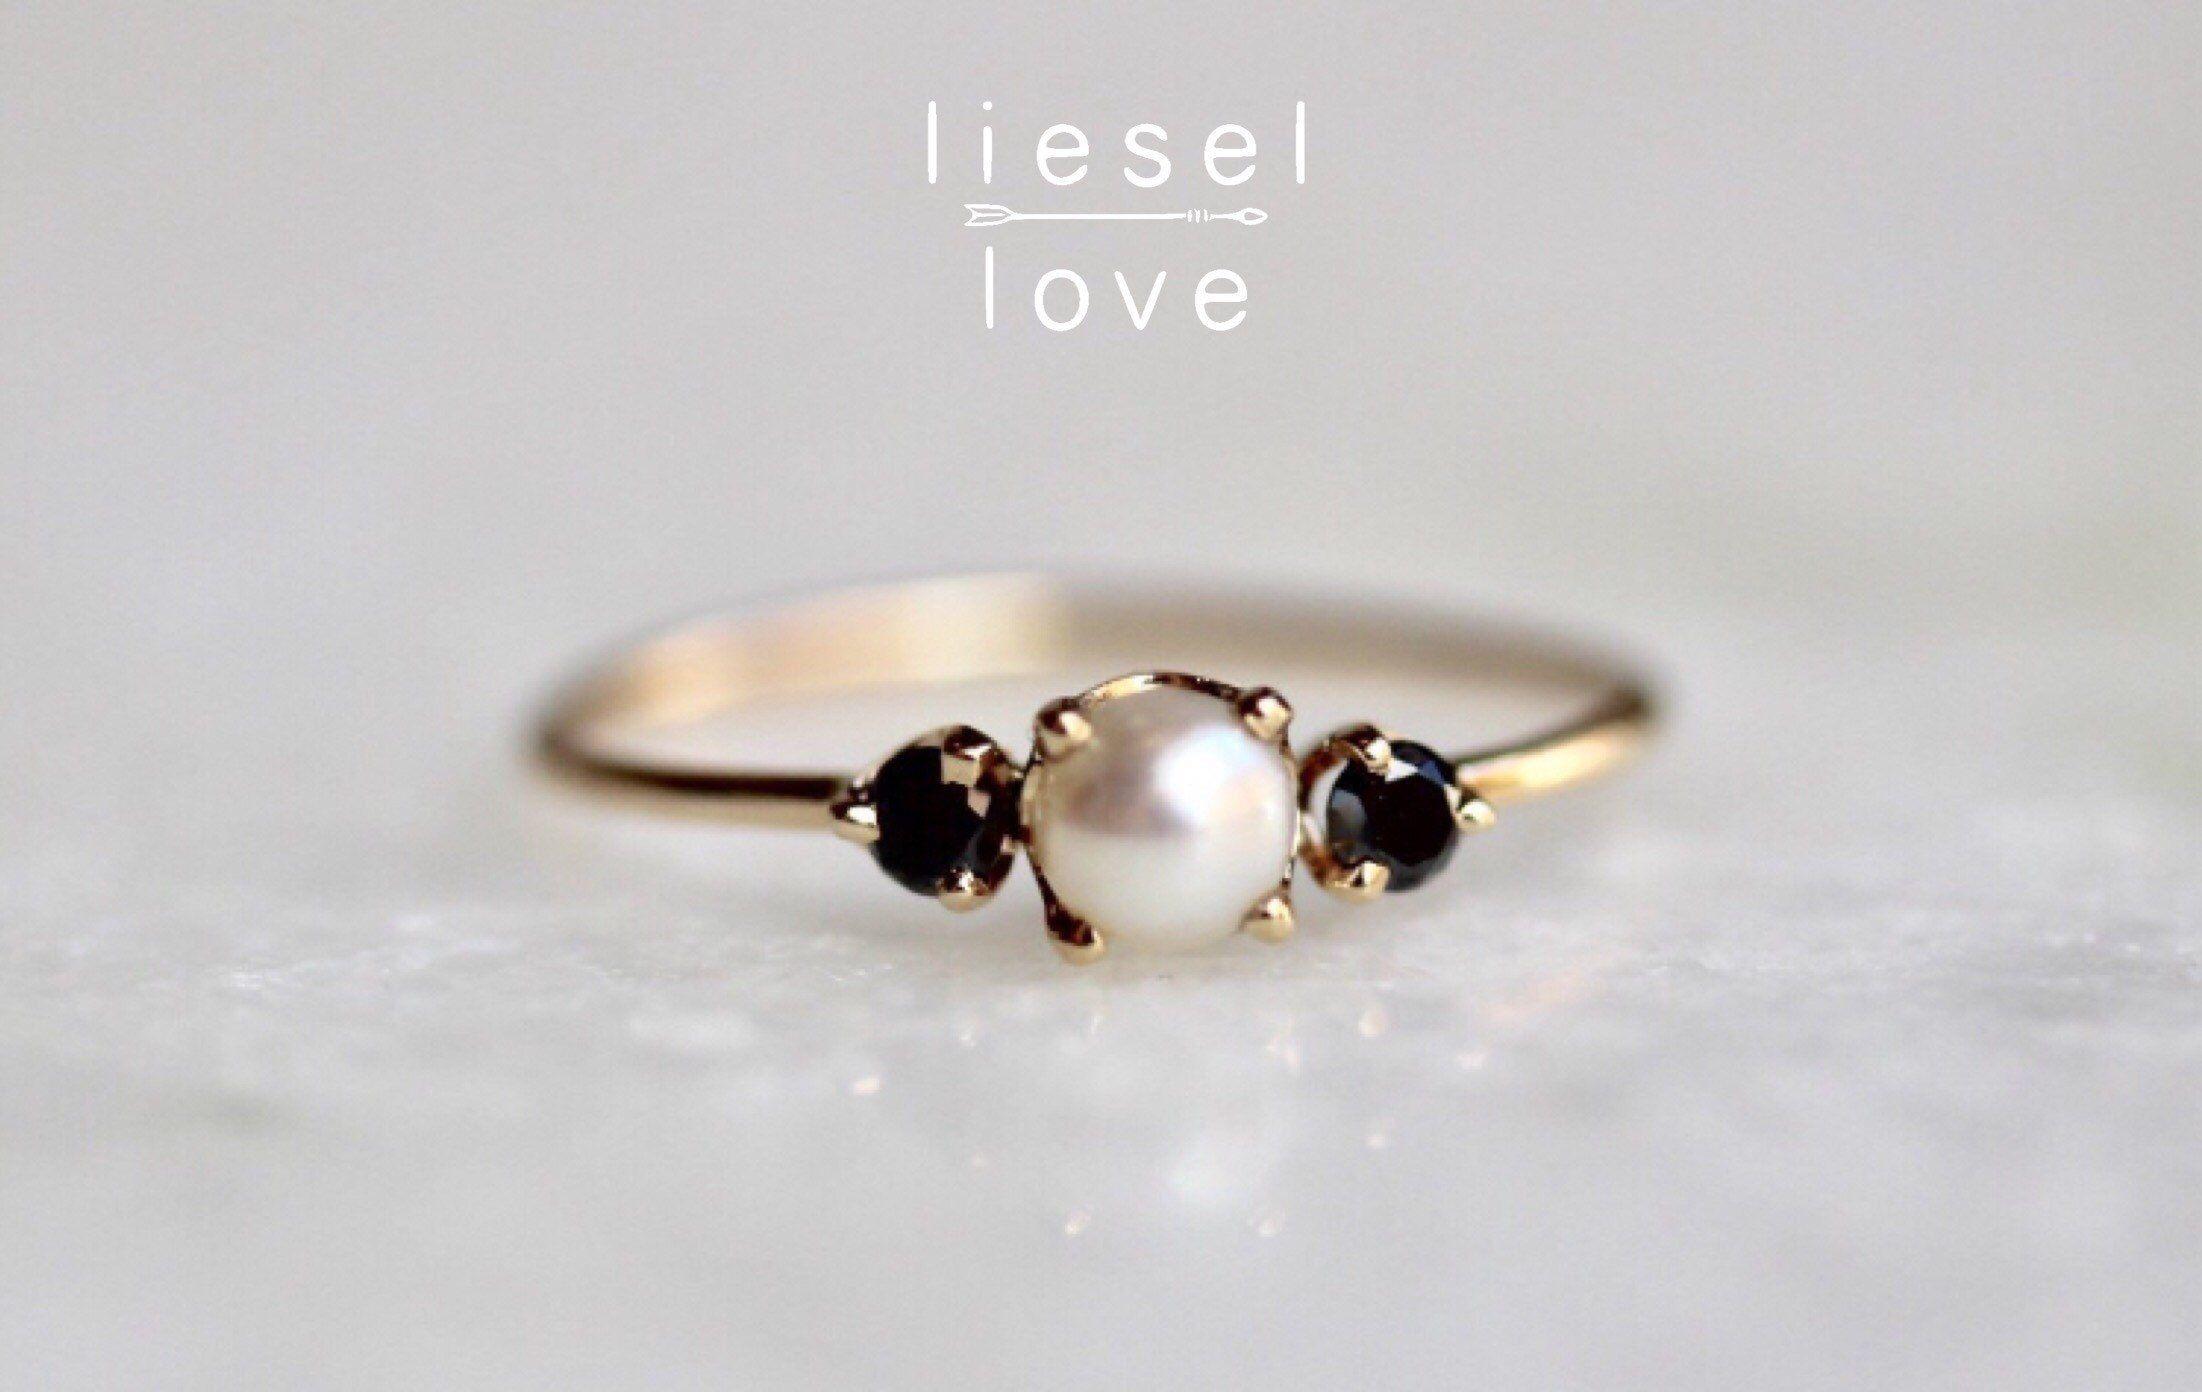 Pearl Engagement Ring Symbolism